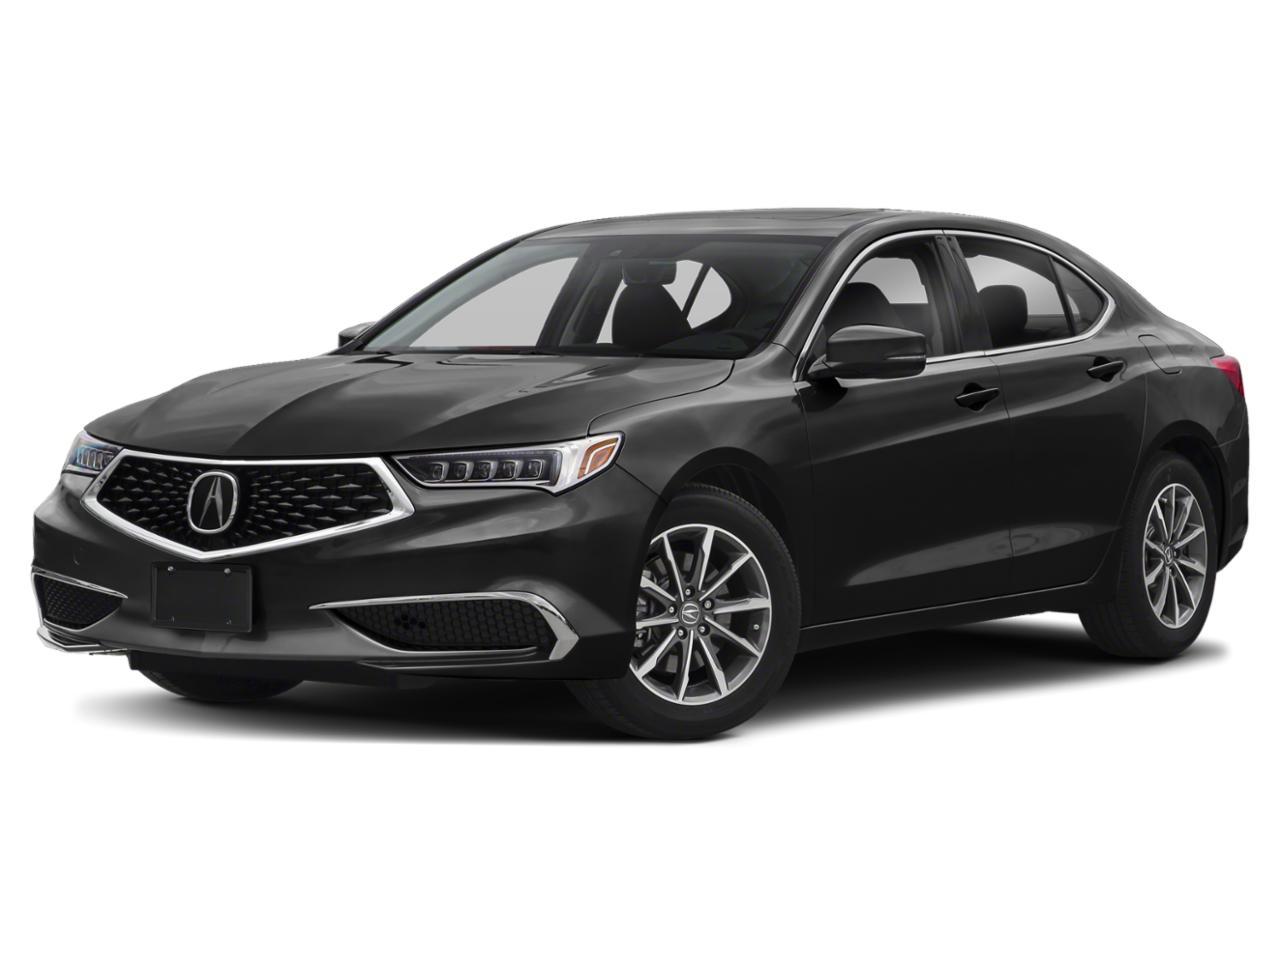 2020 Acura TLX Vehicle Photo in Pleasanton, CA 94588